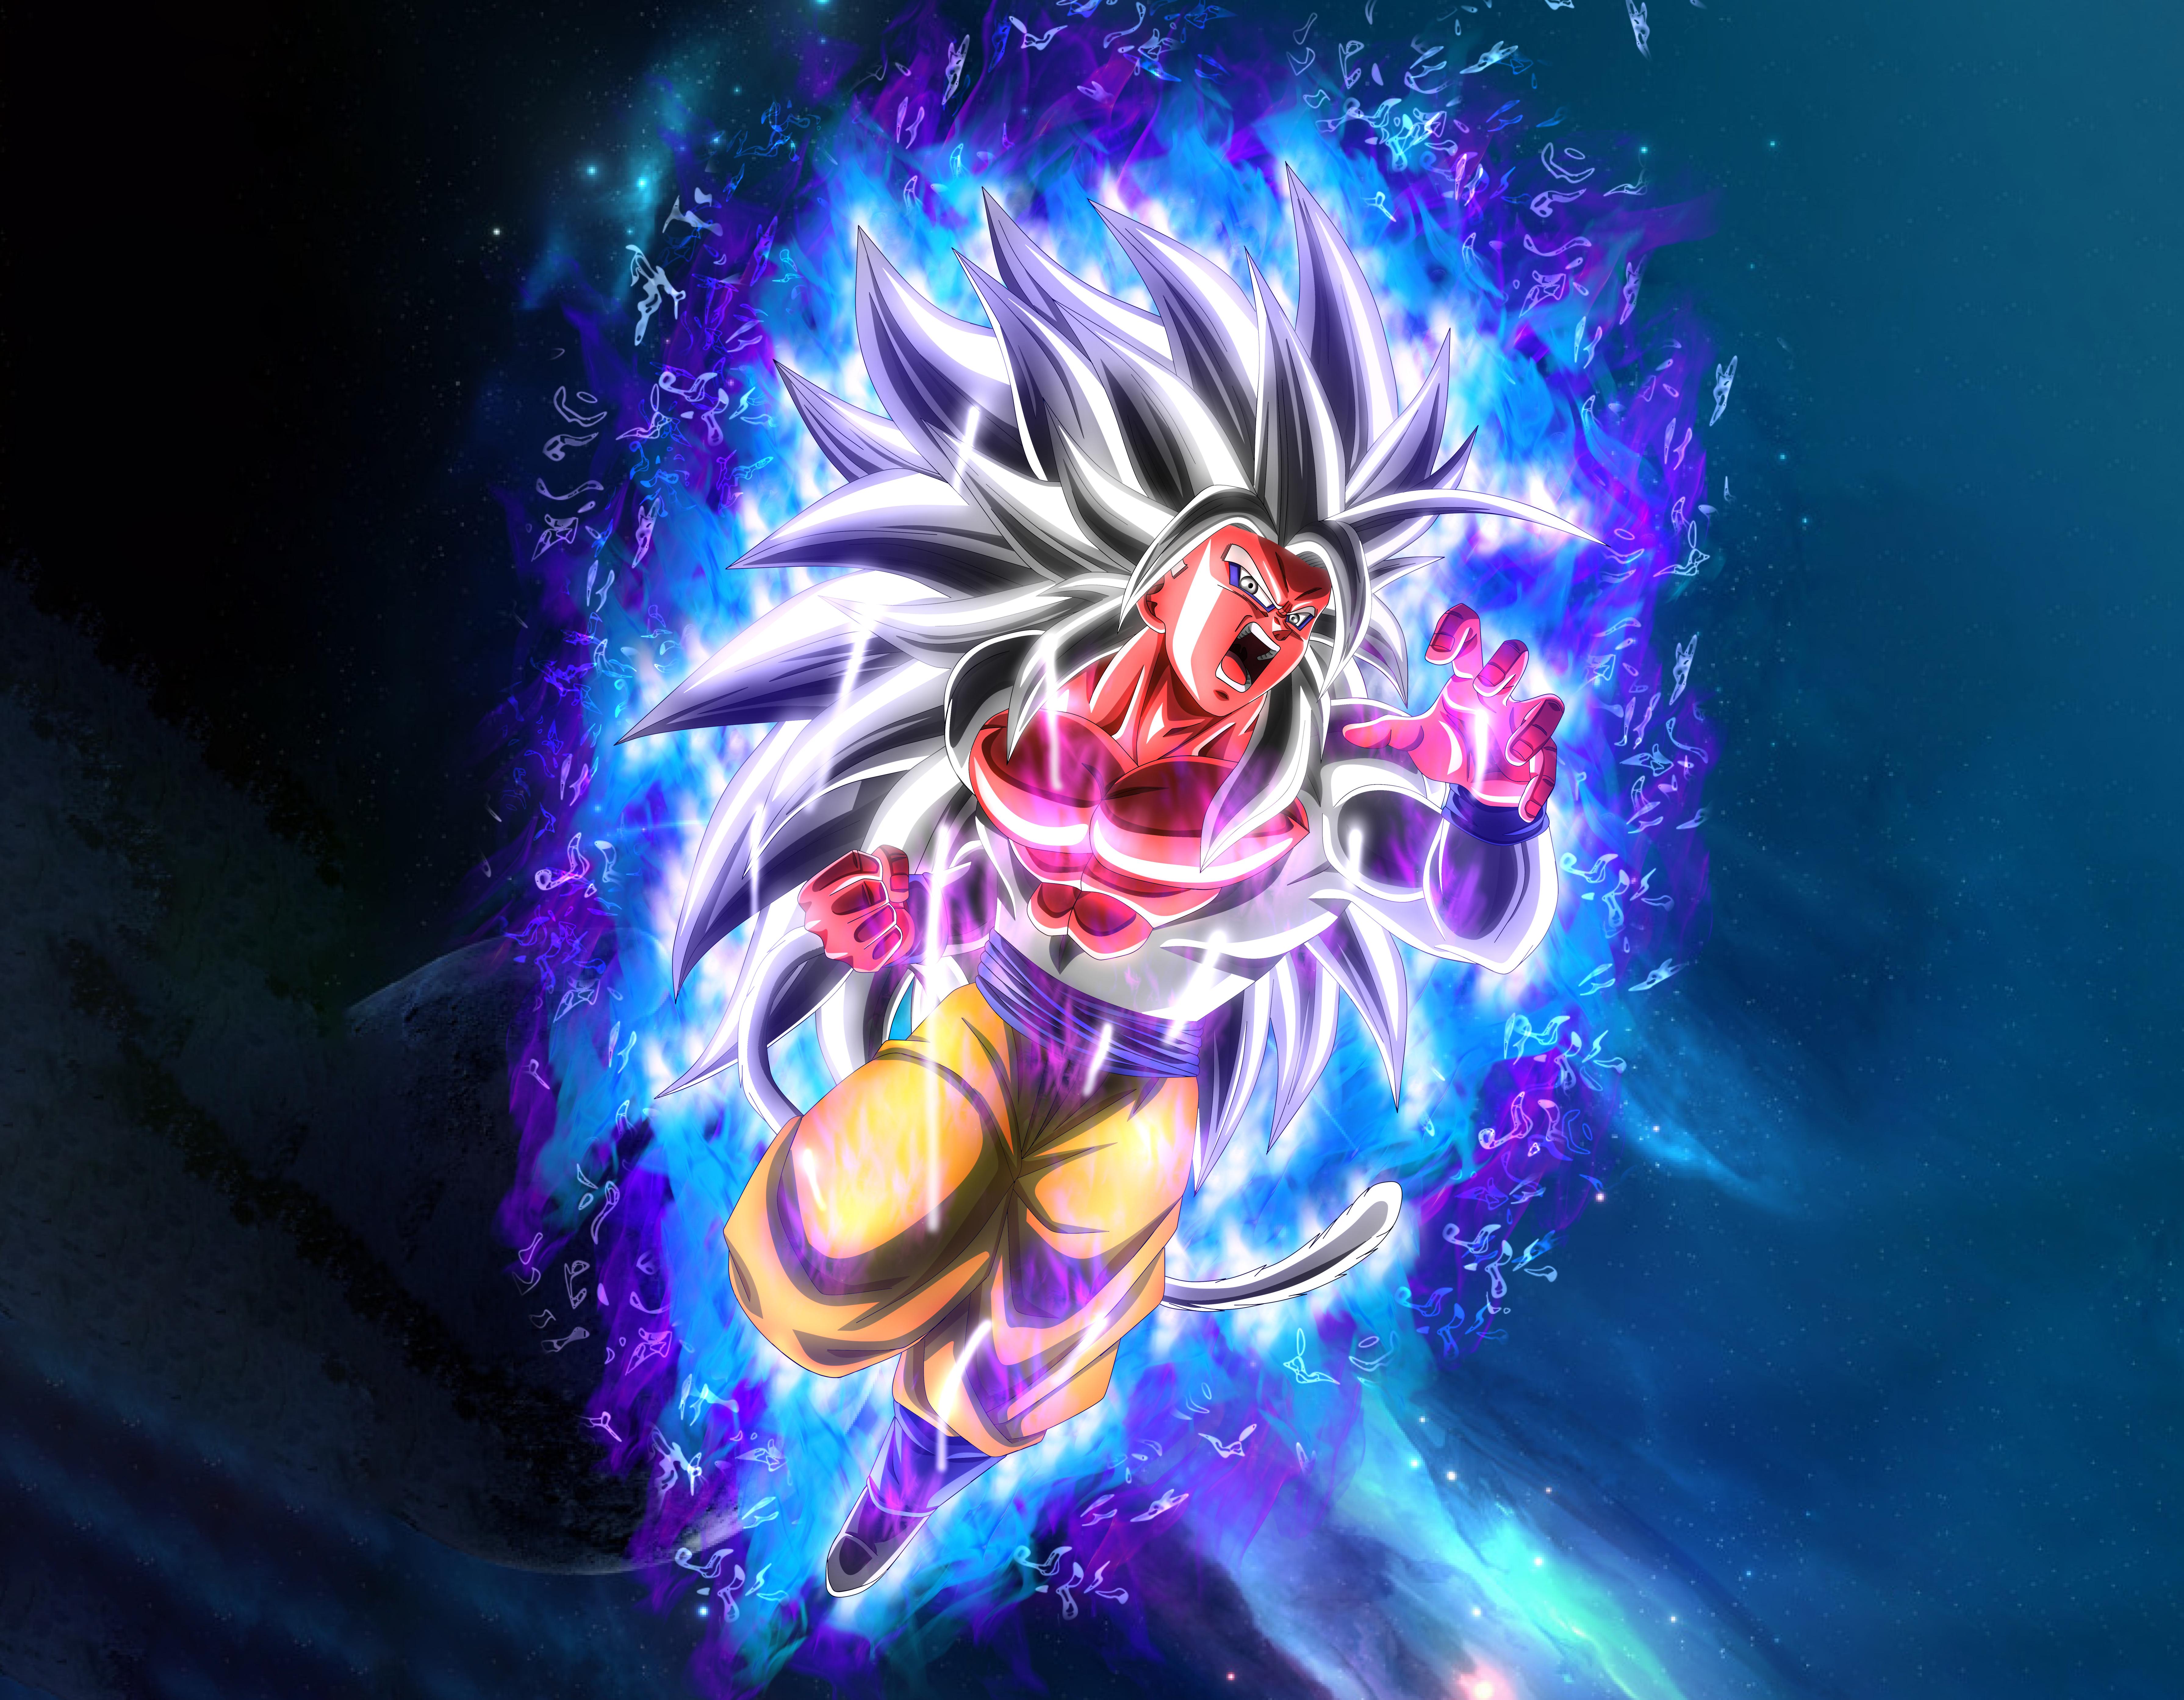 Goku Ssj5 5k Retina Ultra Fondo De Pantalla Hd Fondo De